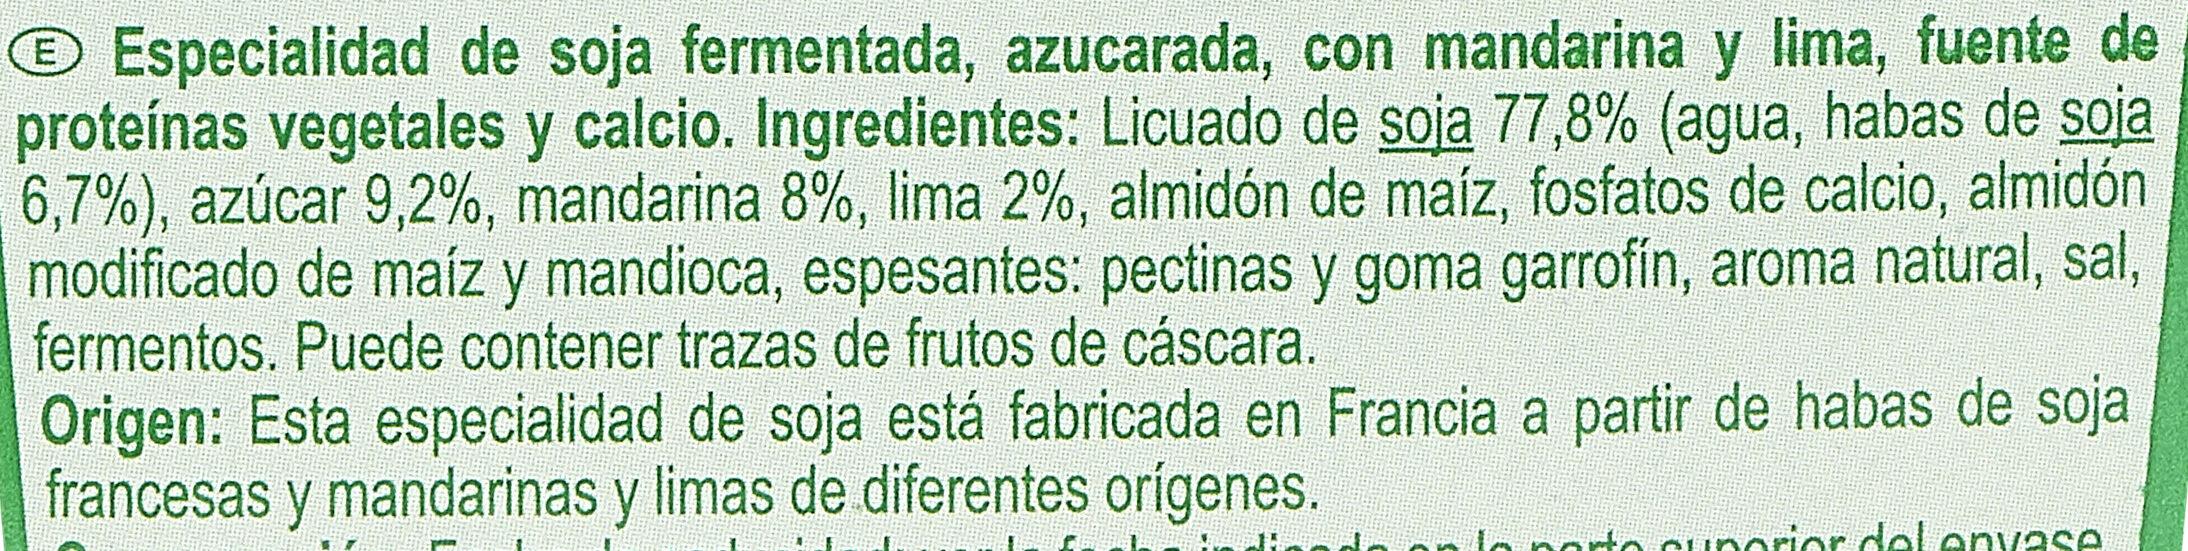 Soja mandarine - citron vert - Ingredientes - es